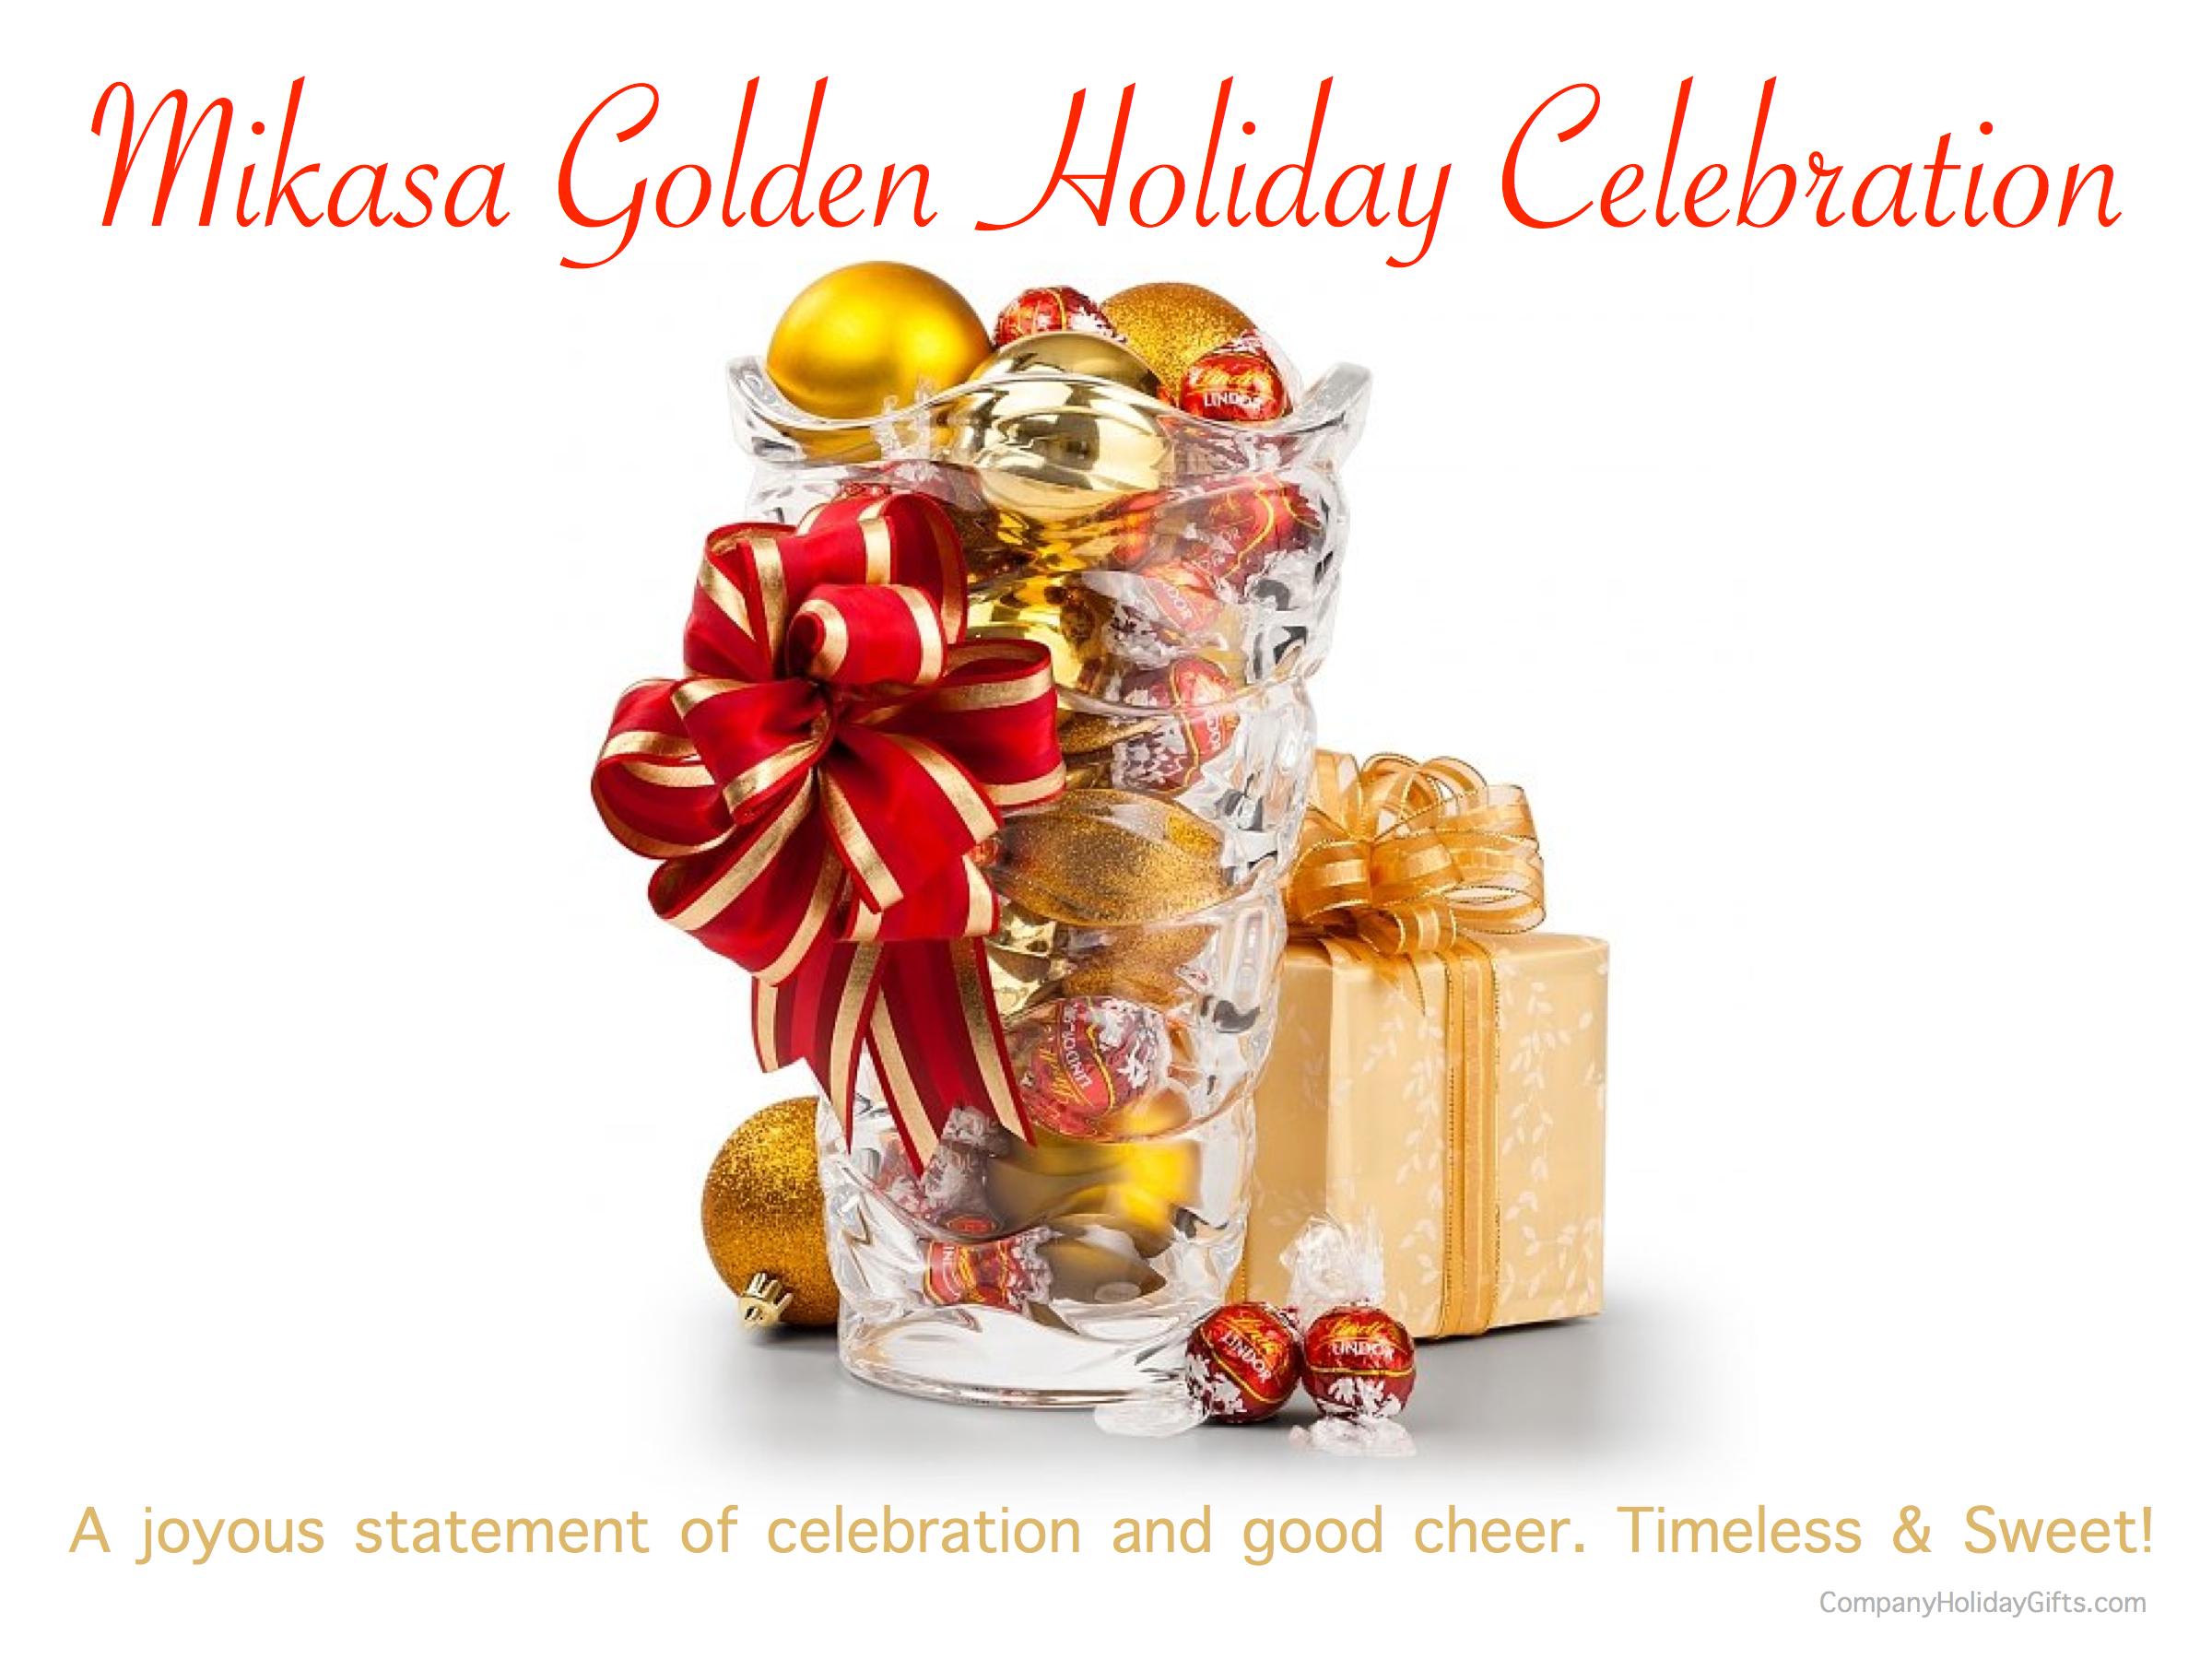 Mikasa Golden Holiday Celebration Holiday Gift